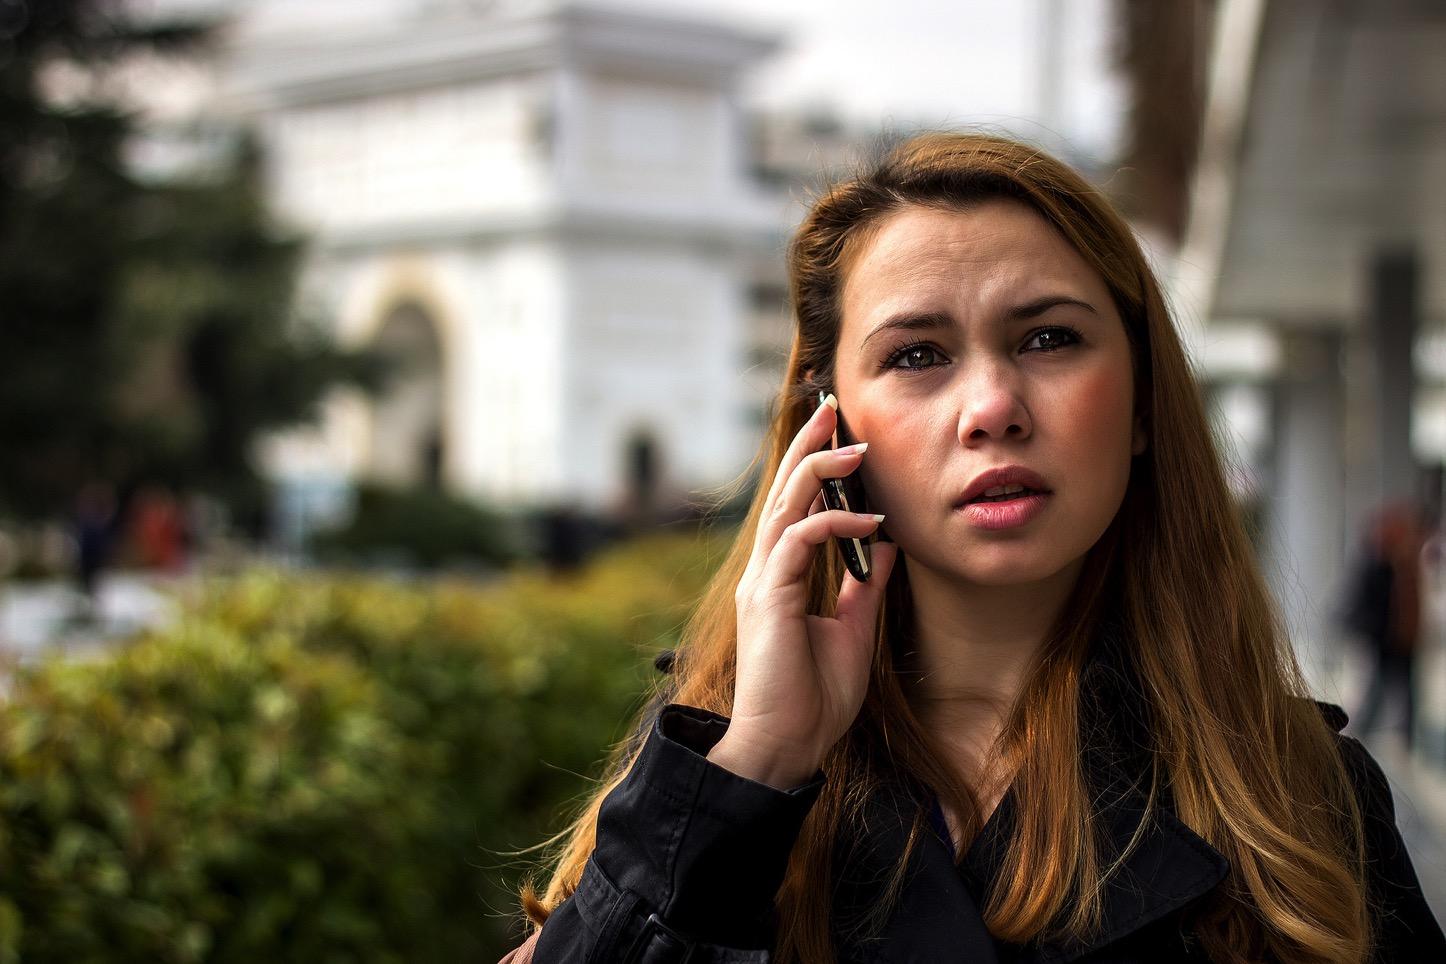 talking-on-iphone.jpg